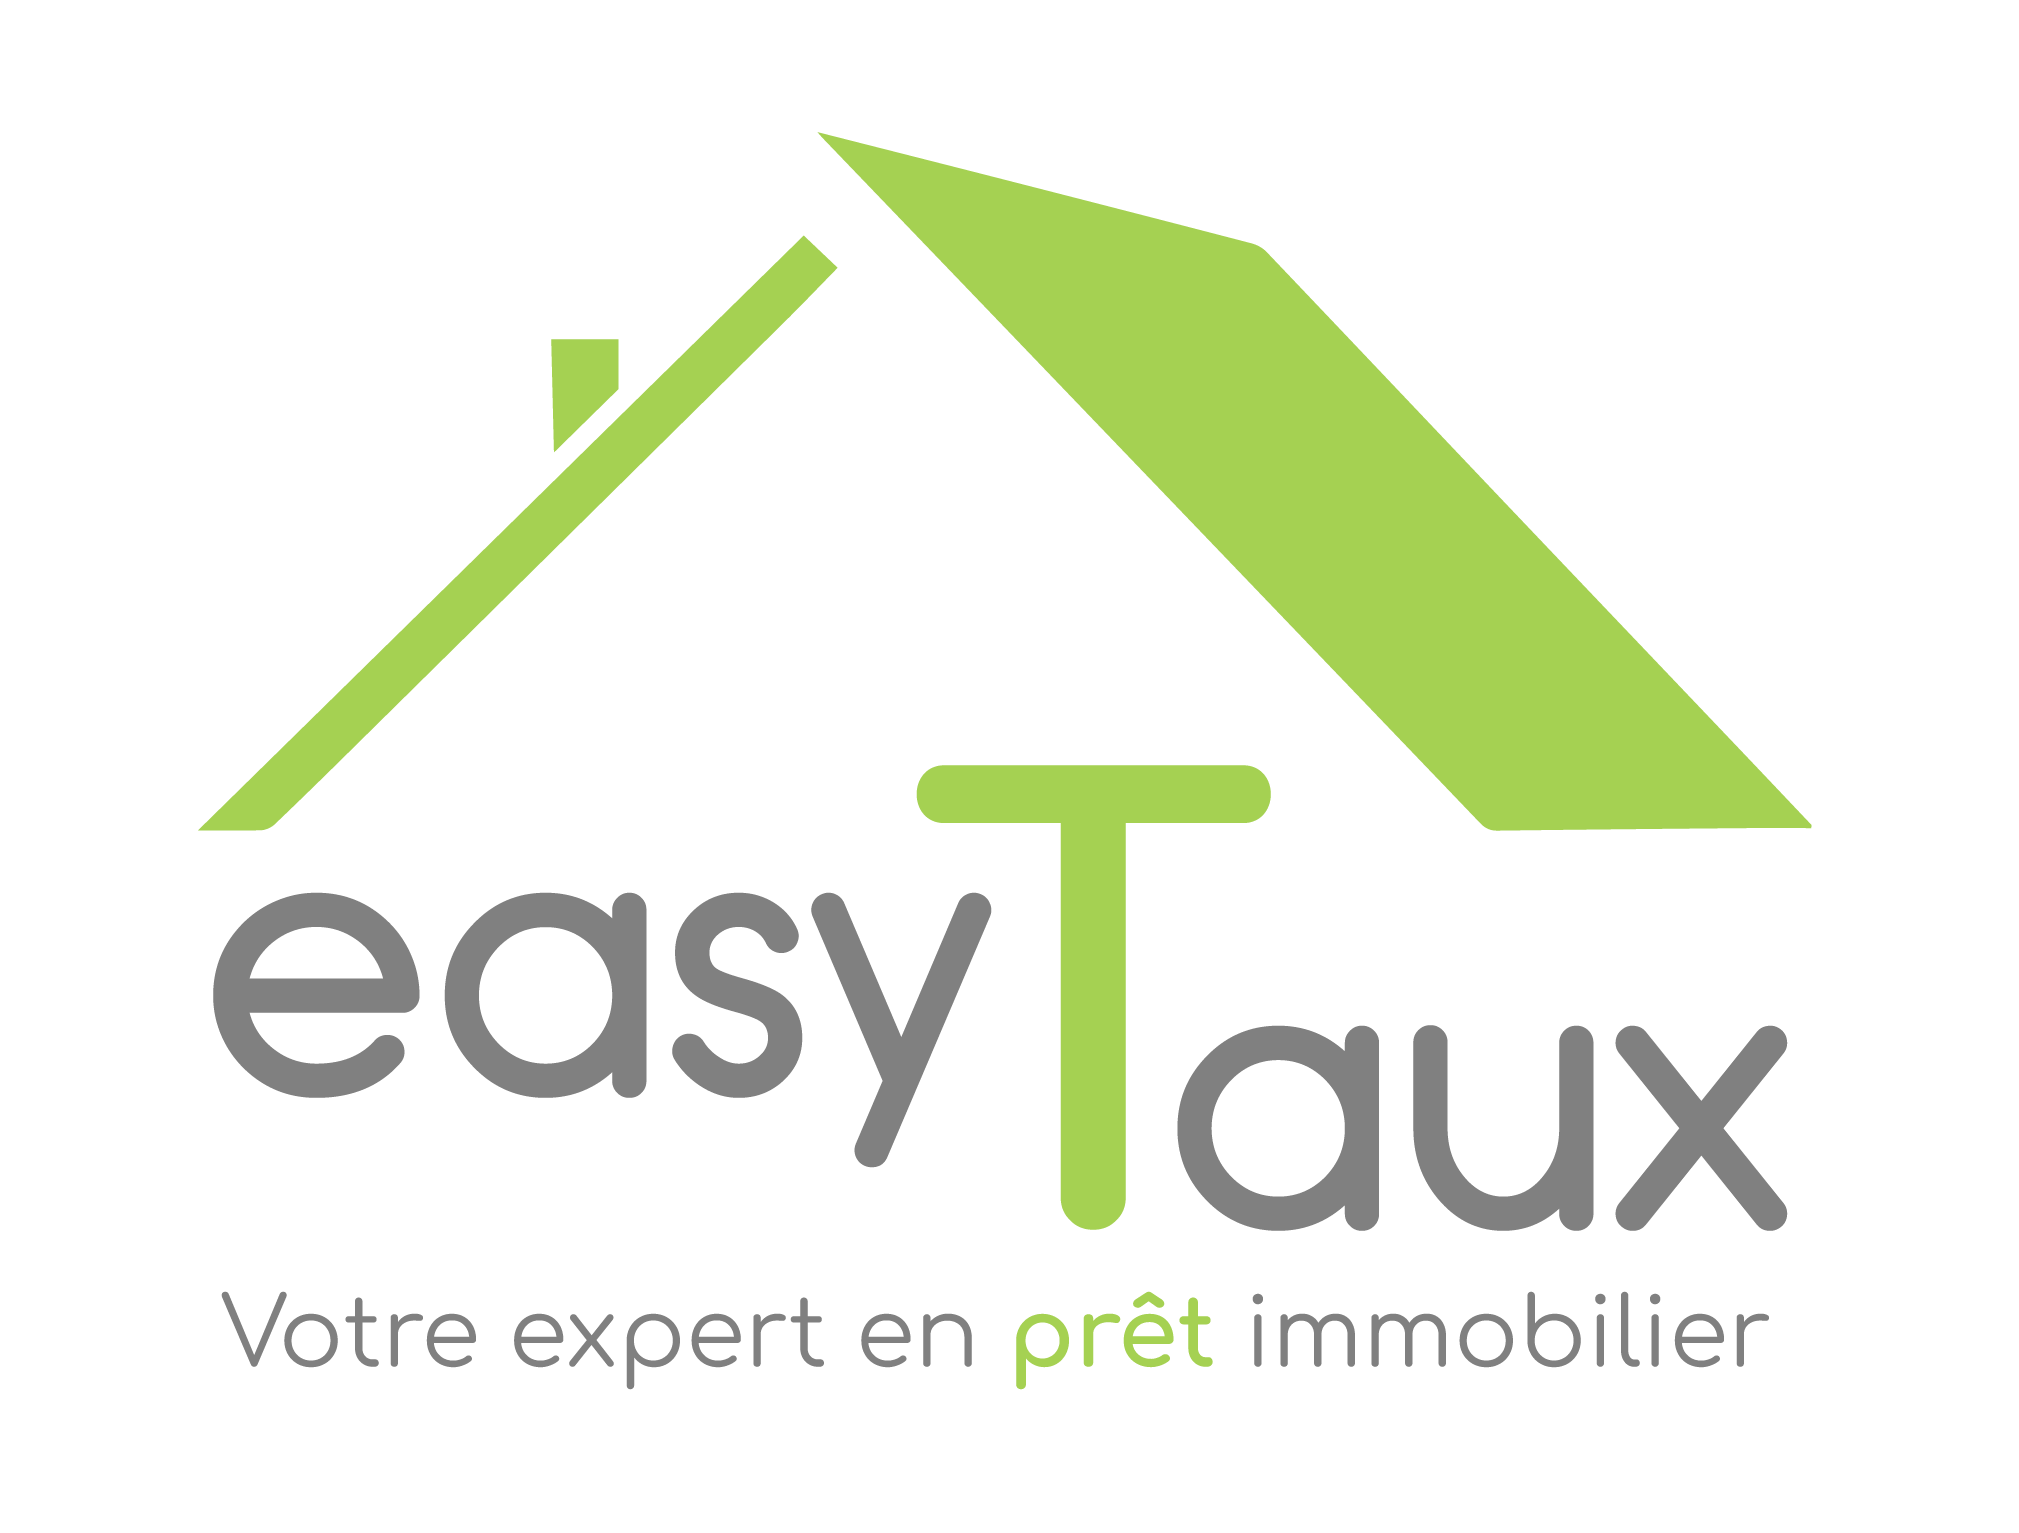 Logo Easytaux new